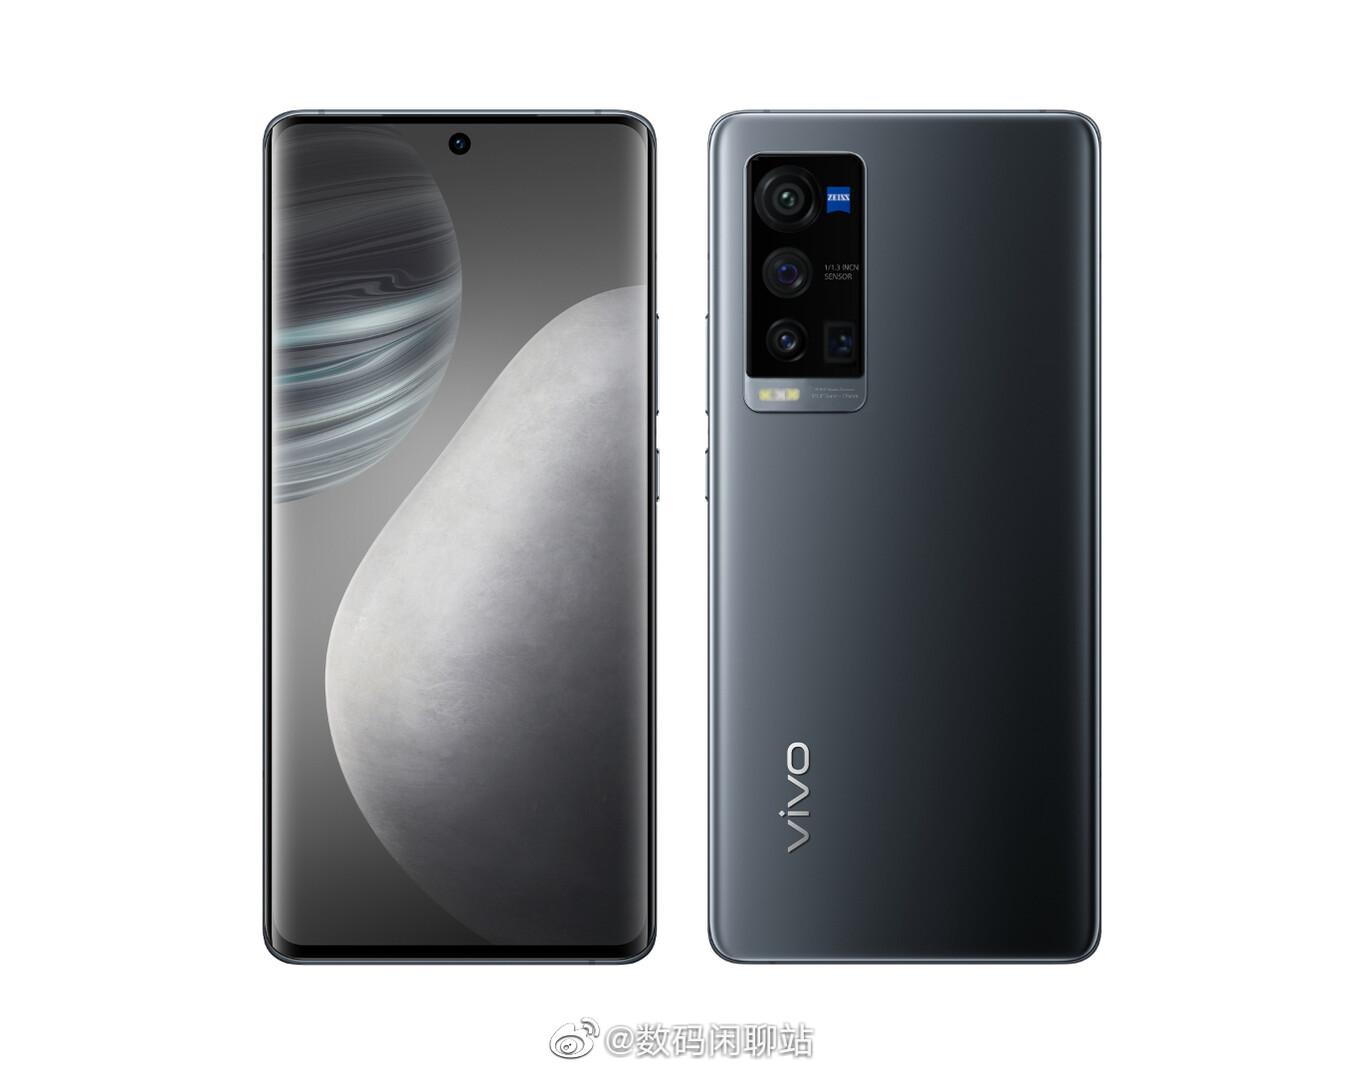 Se filtran características interesantes del VIVO X60 Pro+